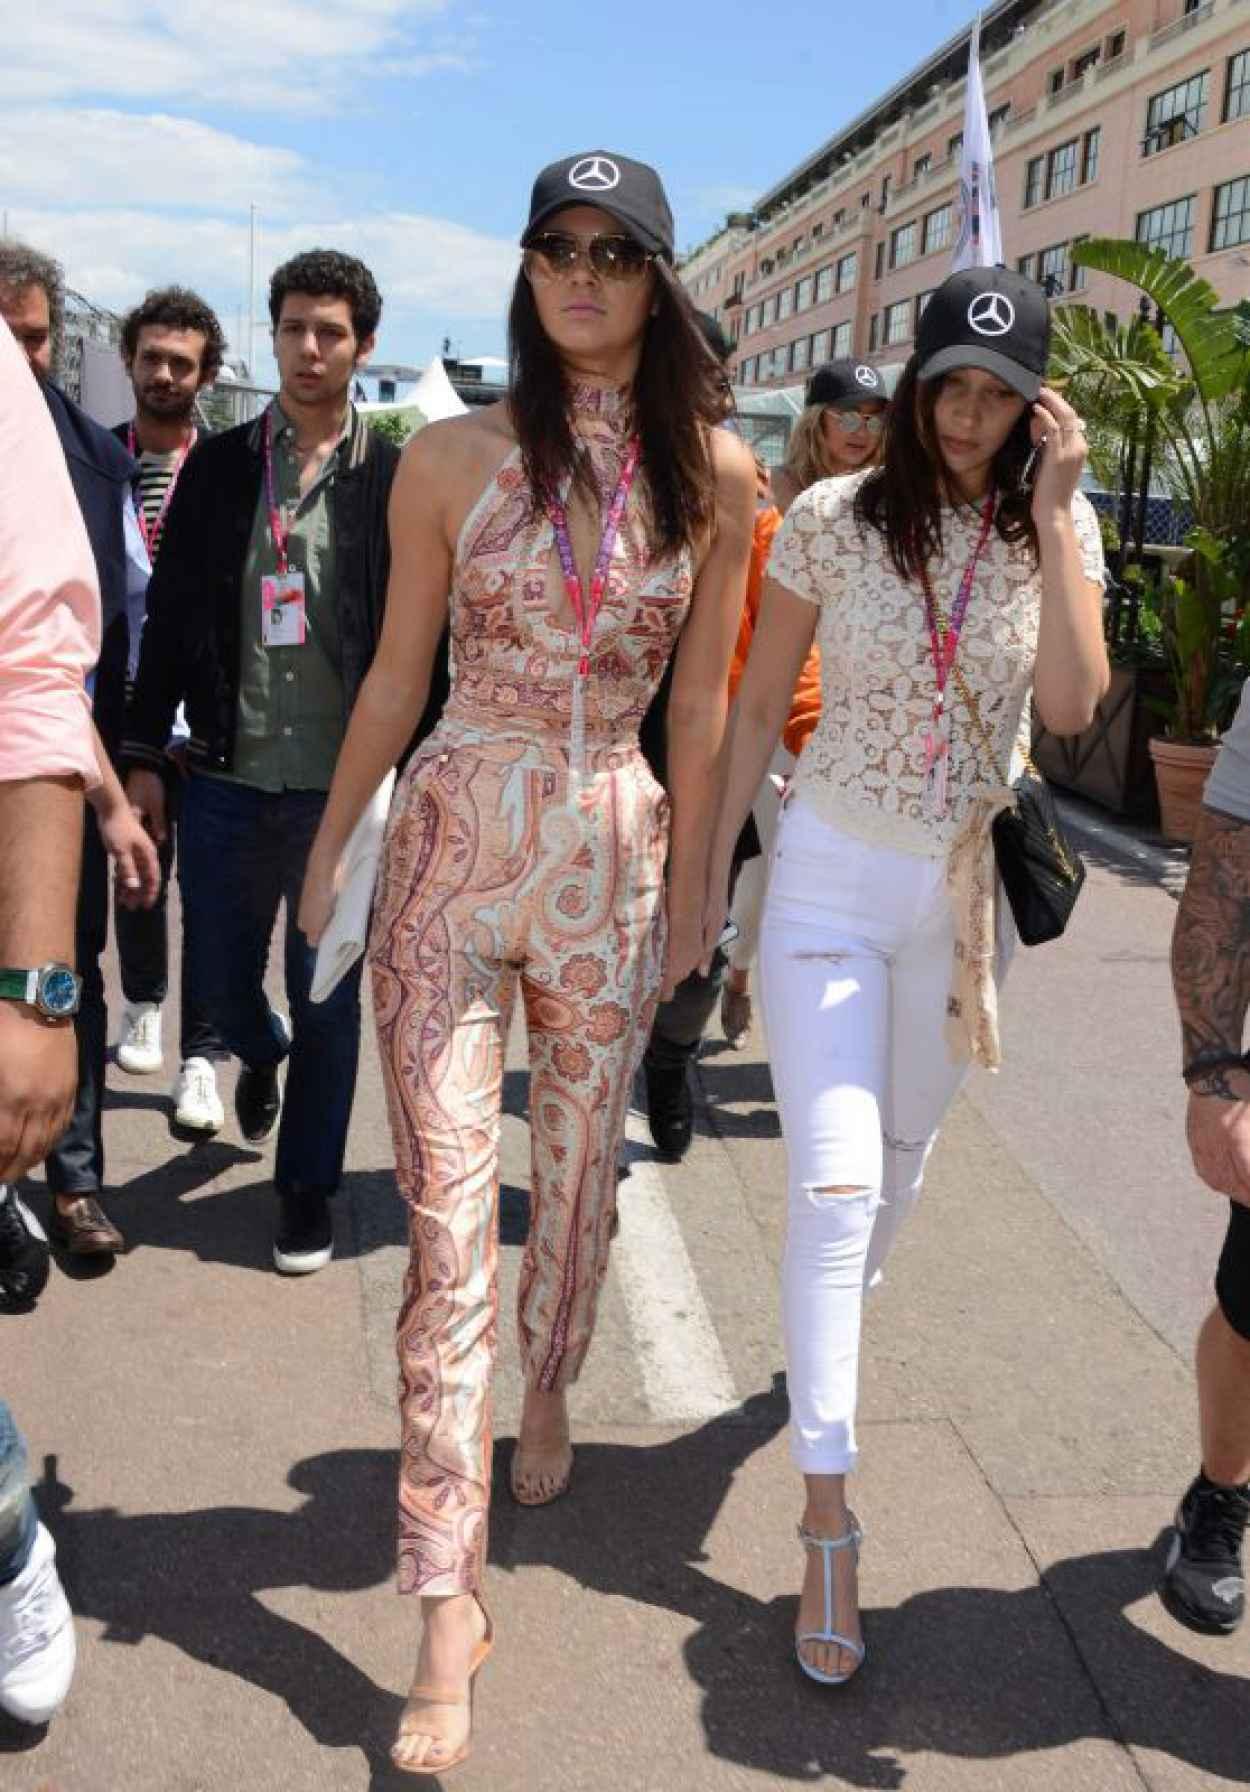 Kendall Jenner, Bella Hadid and Gigi Hadid - F1 Grand Prix of Monaco in Monte-Carlo, May 2015-1